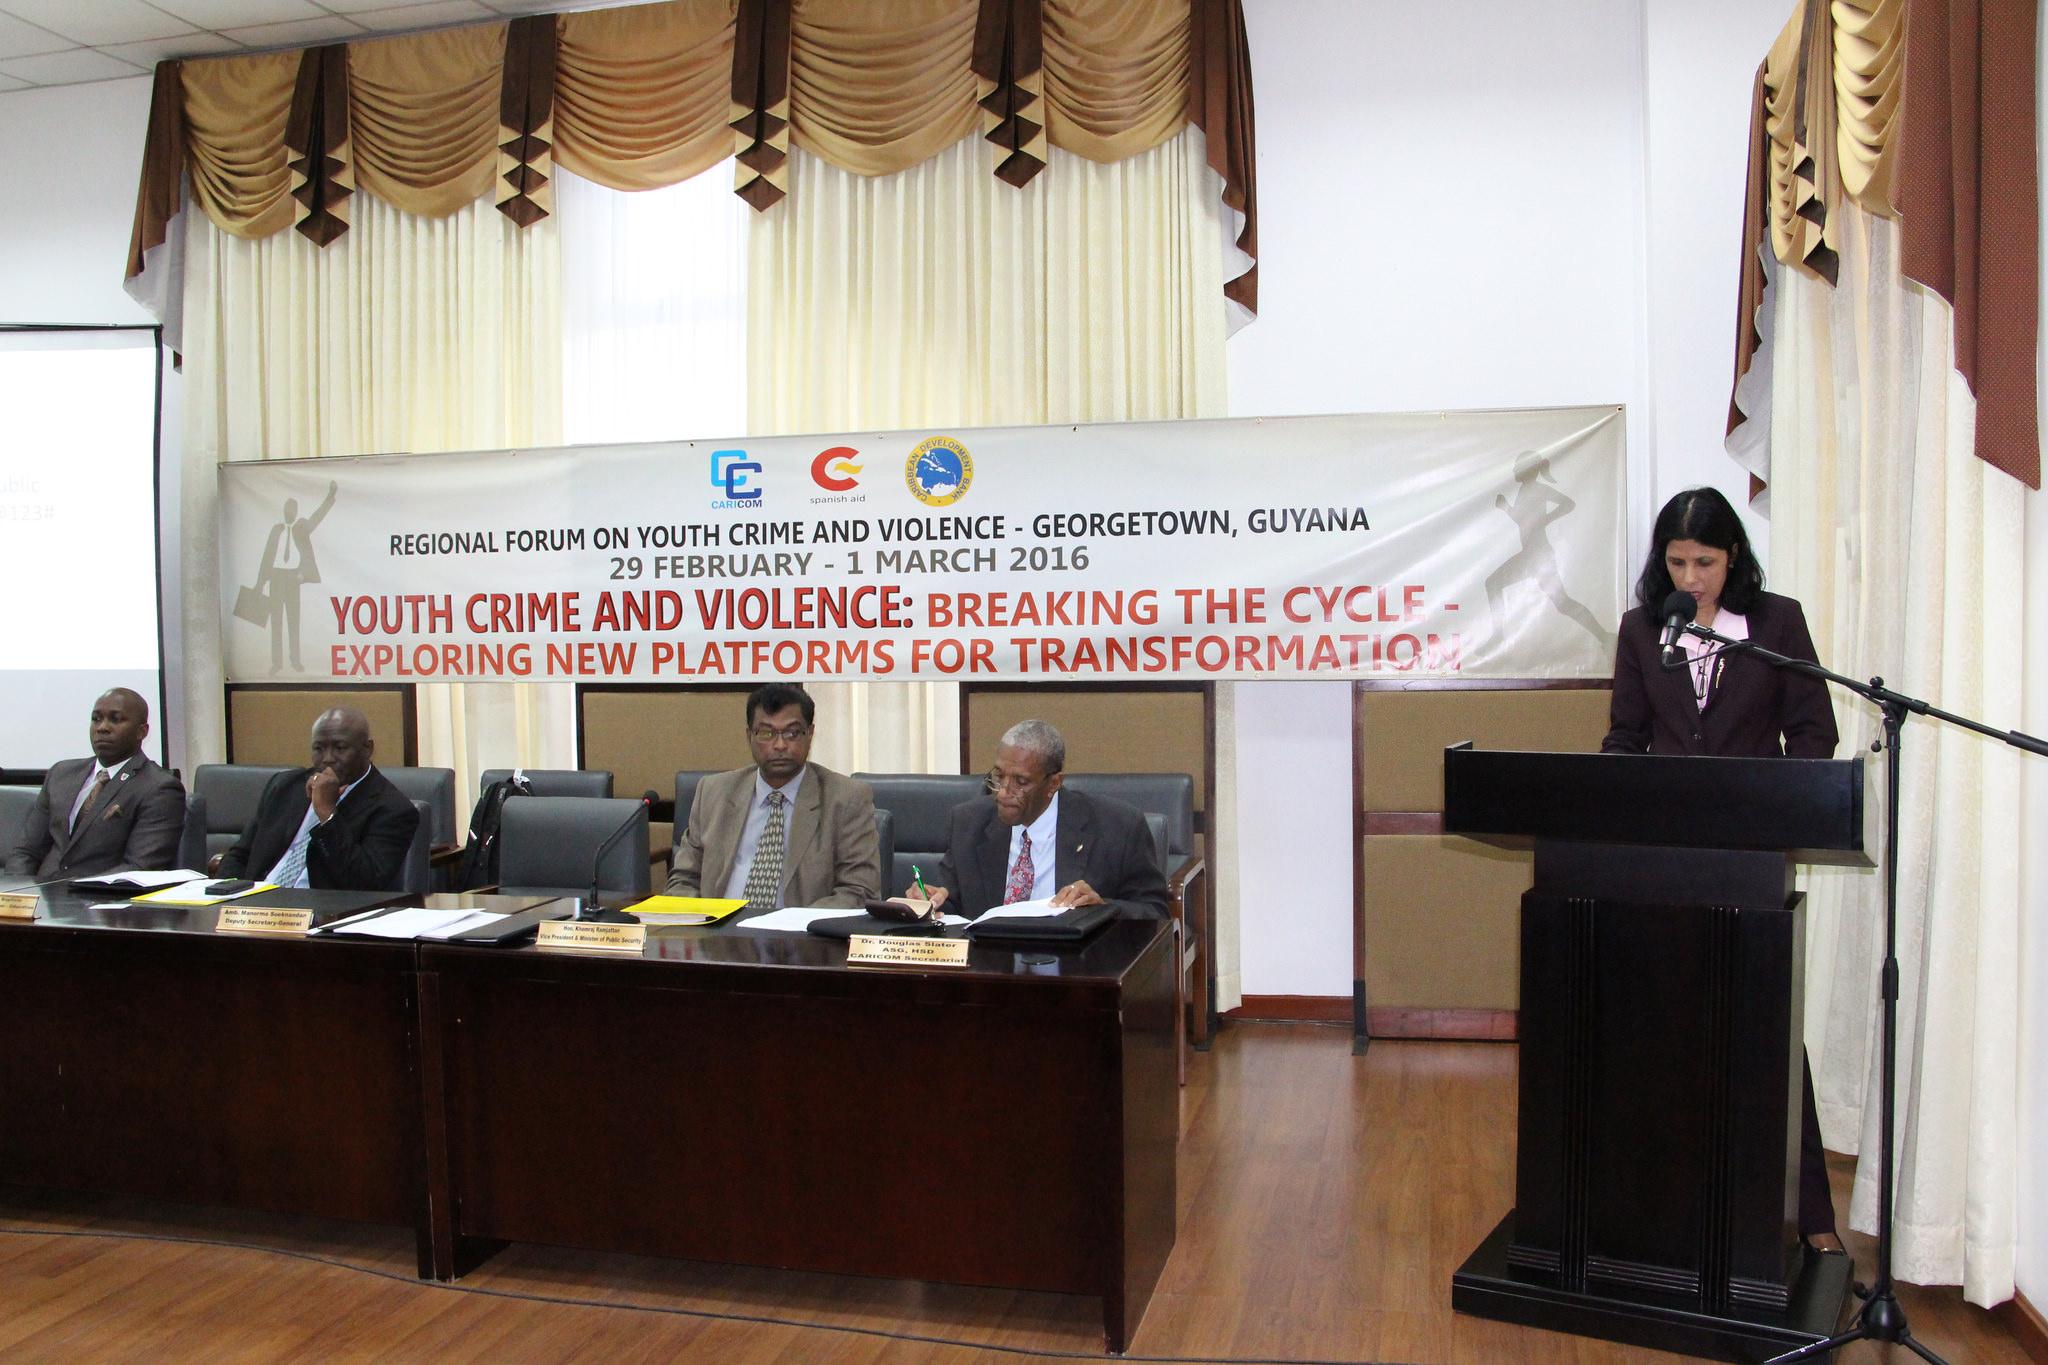 Dr Manorma Soeknandan Deputy Secretary General, Caricom Secretariat delivering remarks at the Regional Forum Of Youth Crime And Violence